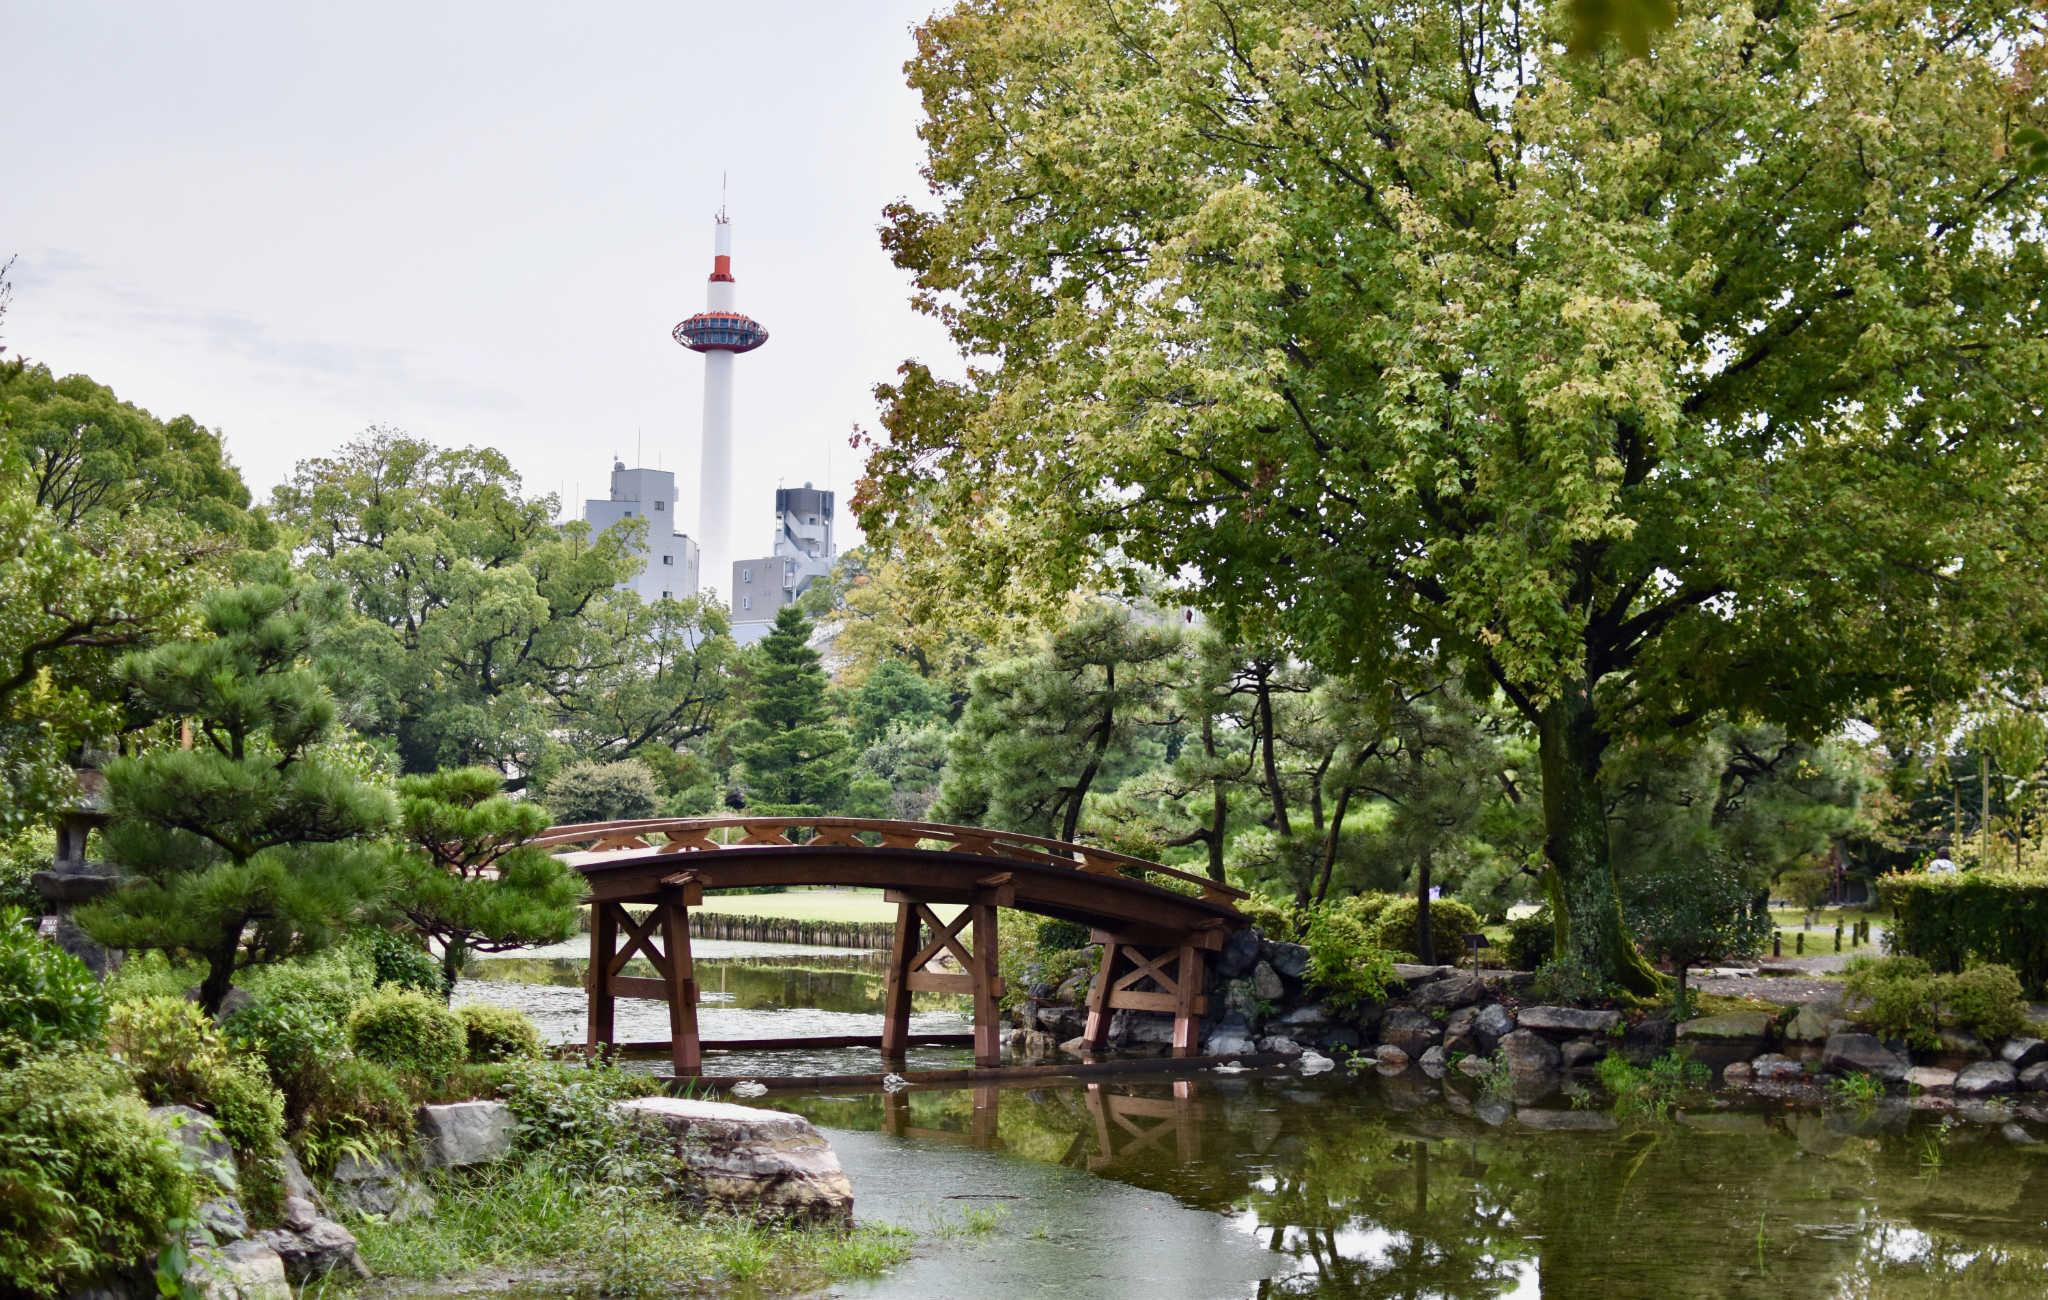 Le pont Shinsetsu-kyo emjambe le lac